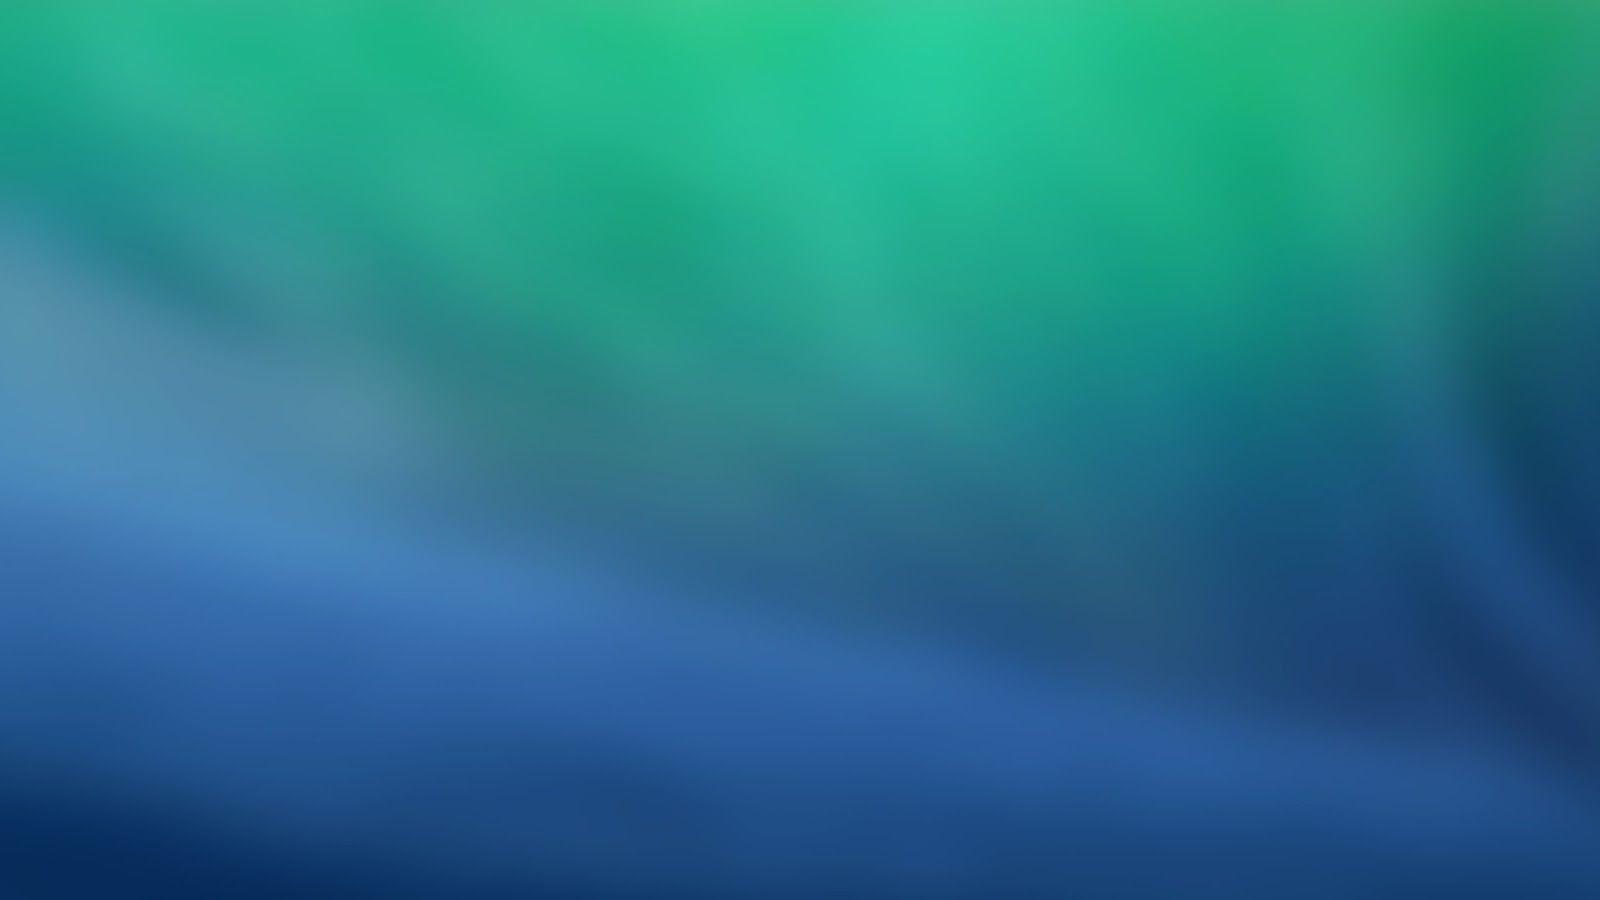 change the login screen wallpaper in os x mavericks | hd wallpapers